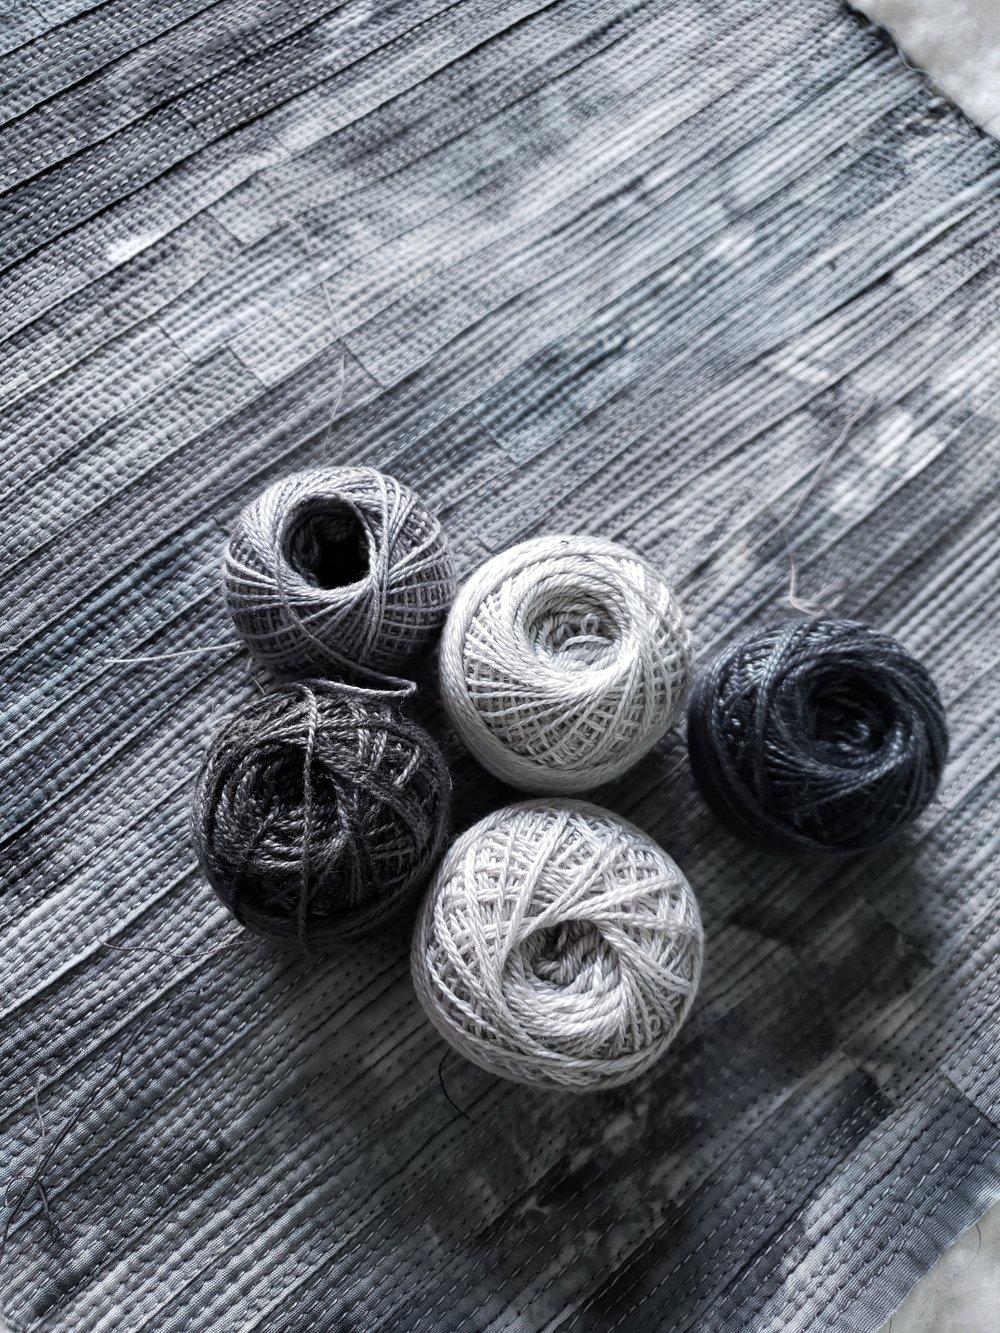 Choosing thread...adding subtle texture